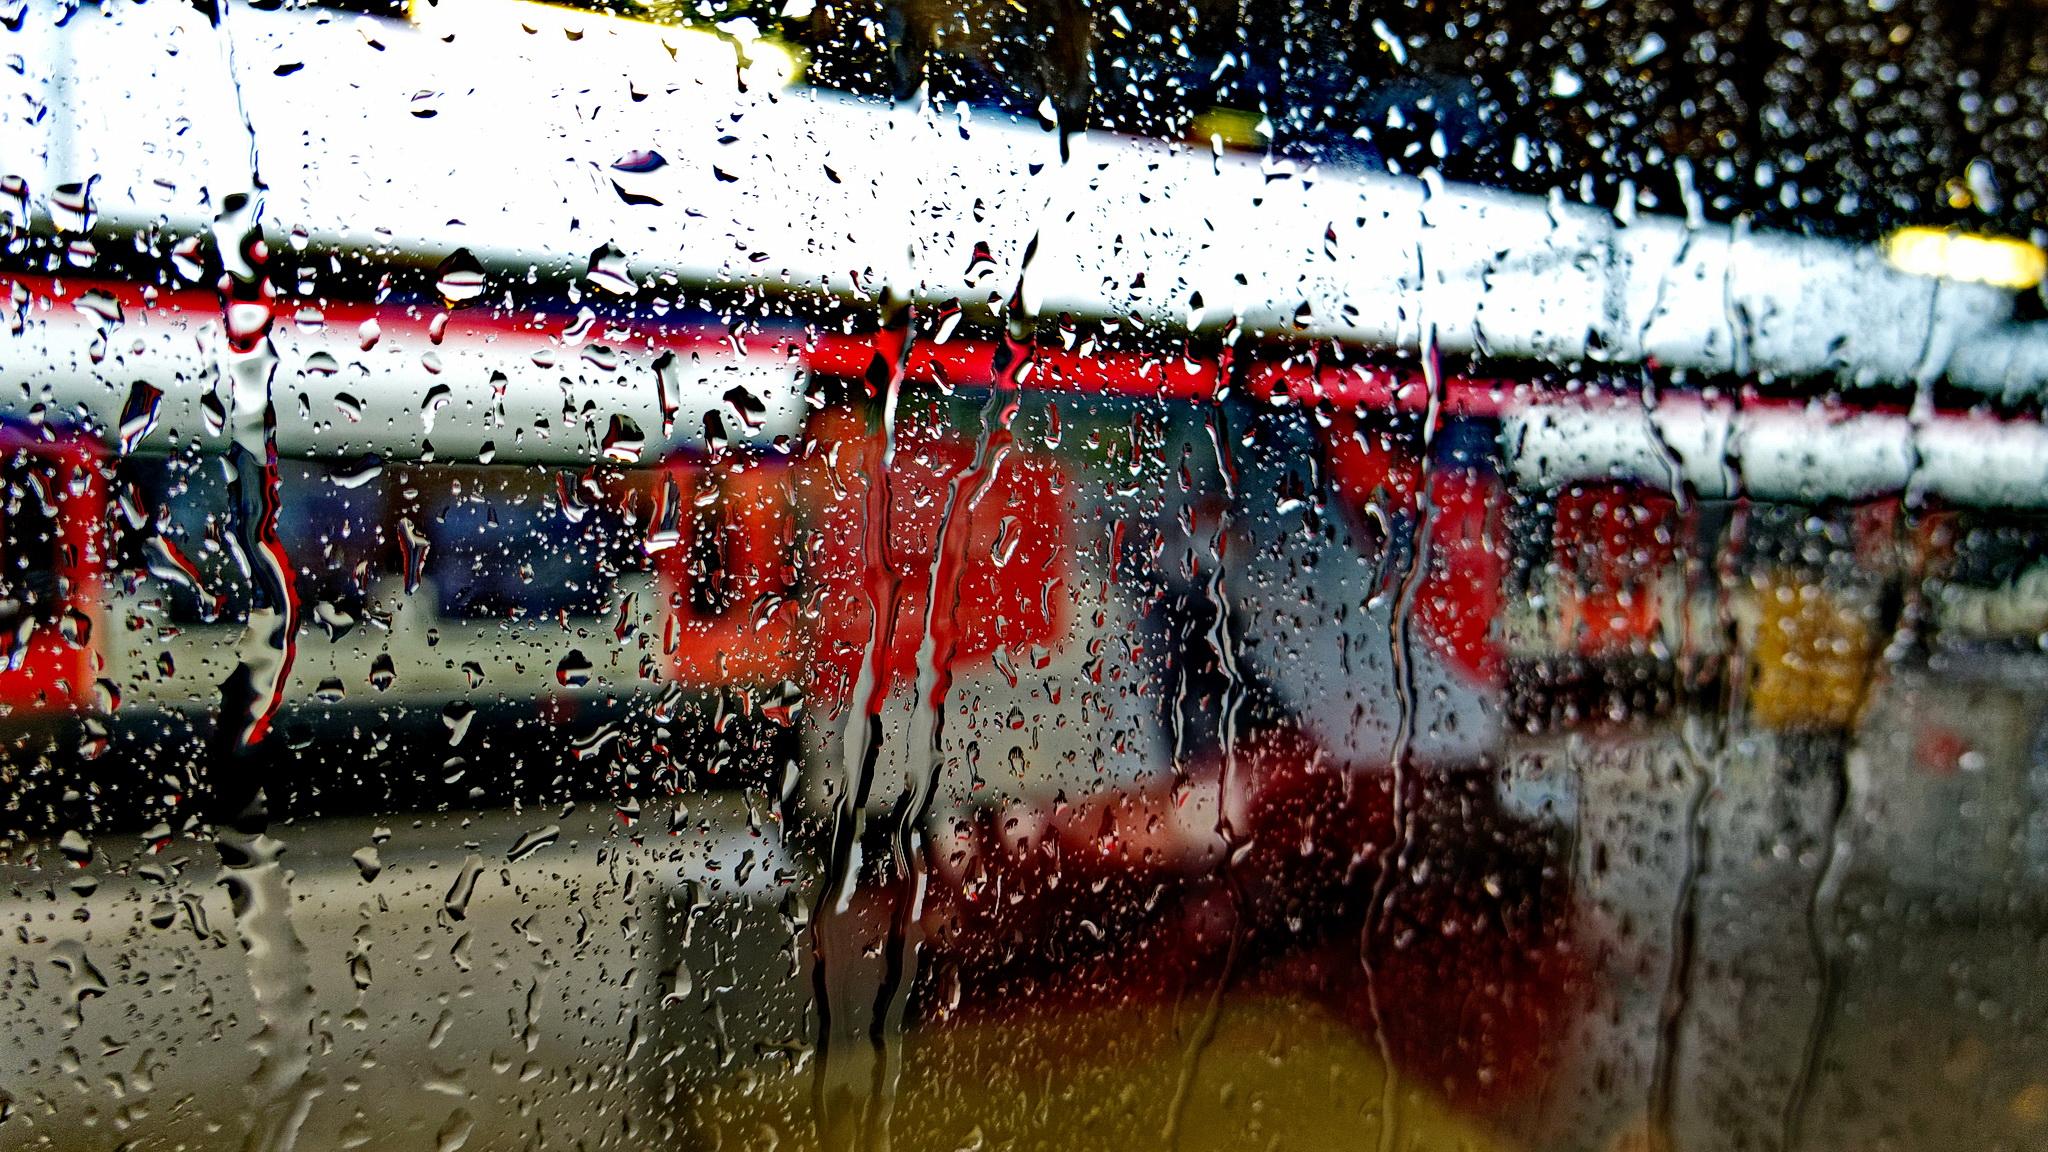 Bei Regen im Zug am Bahnhof